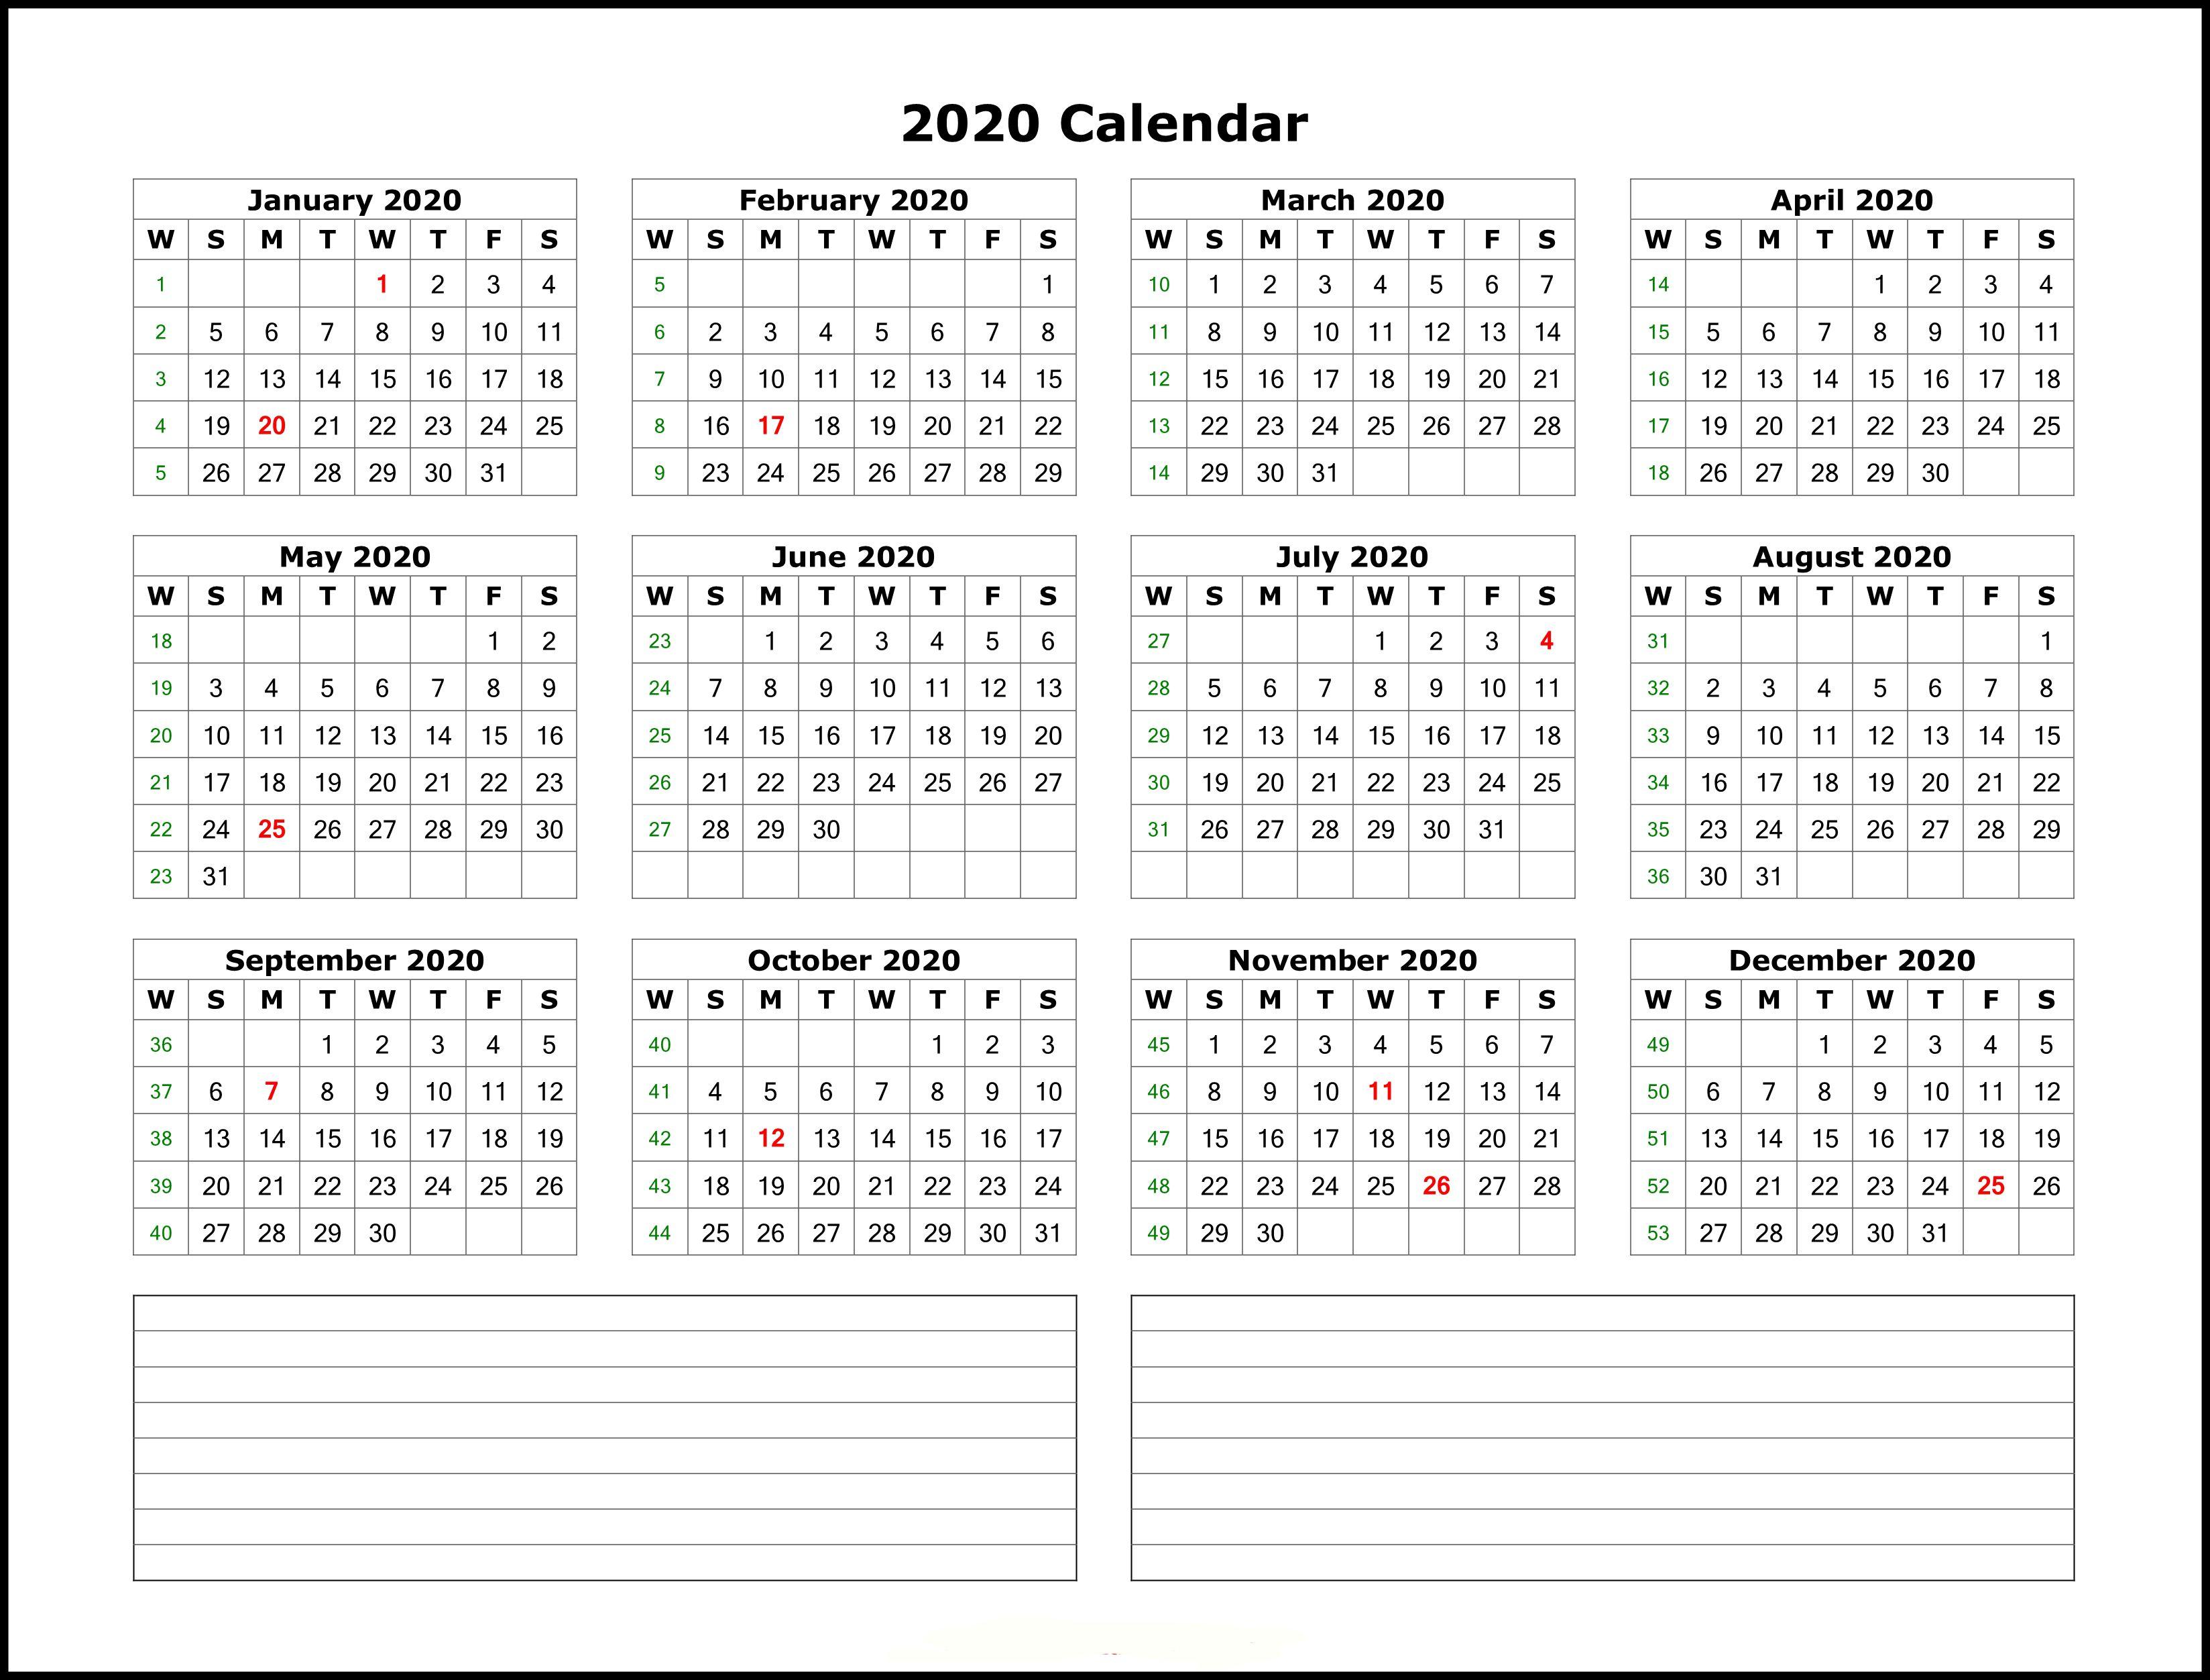 004 Beautiful 2020 Calendar Template Excel Highest Clarity  Microsoft Editable In Format Free DownloadFull